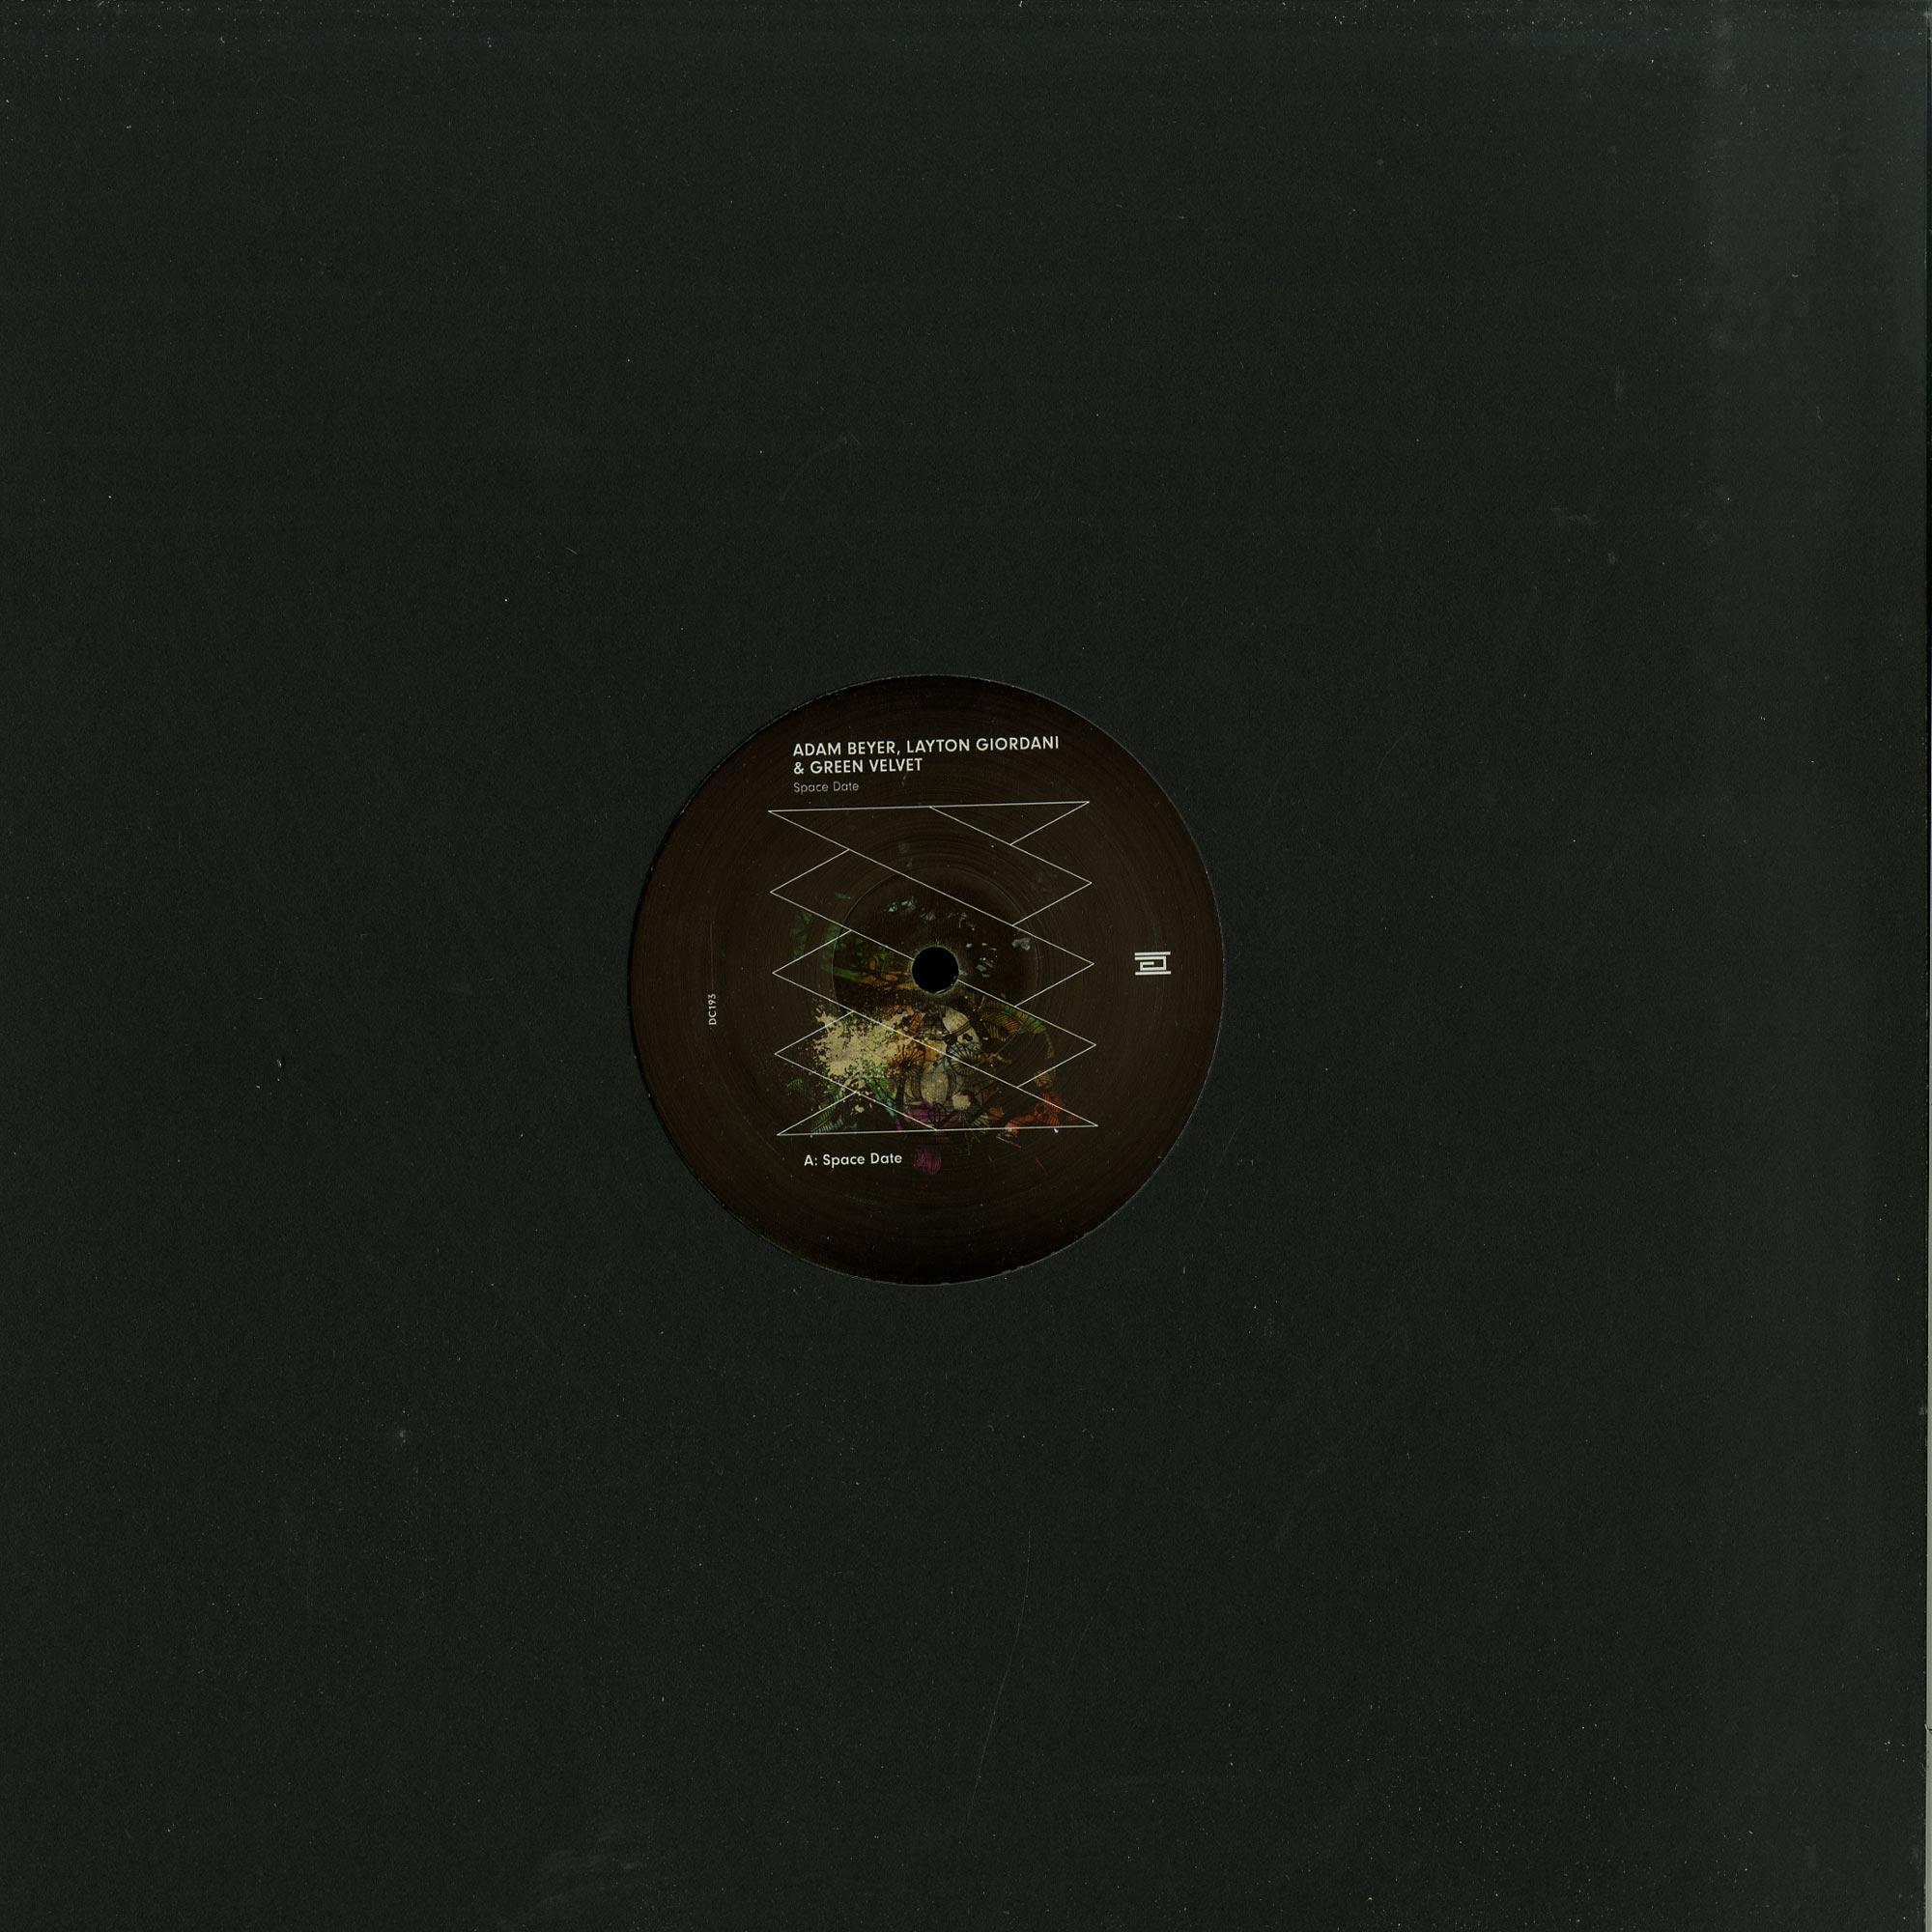 Adam Beyer, Layton Giordani & Green Velvet - SPACE DATE